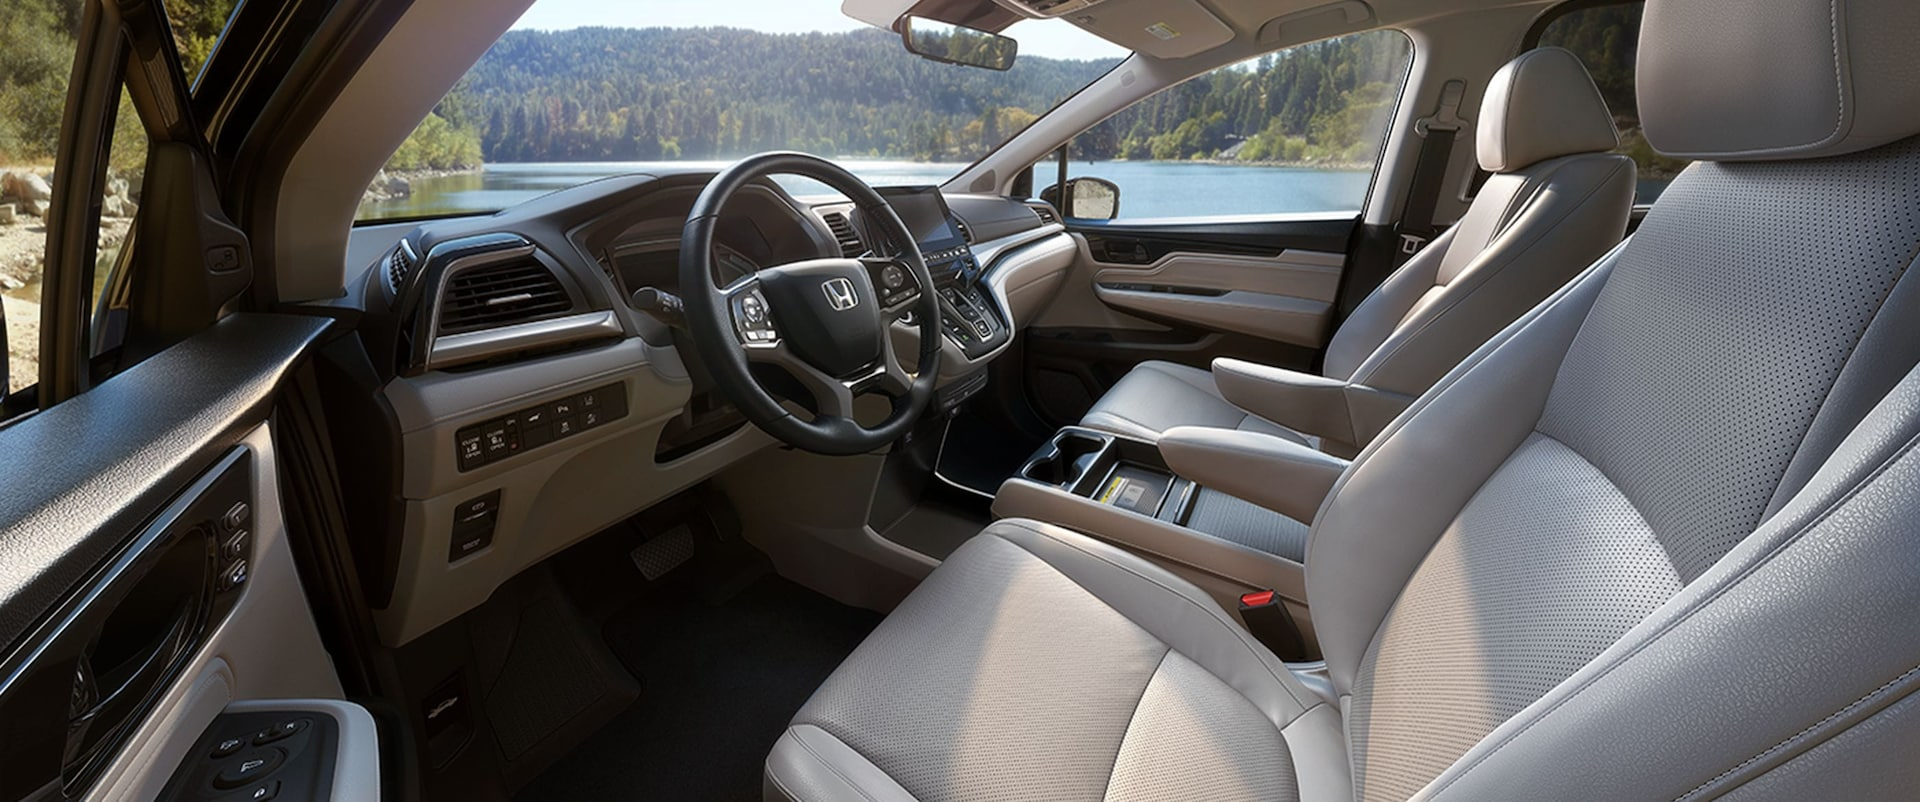 Honda Odyssey Ex L Vs Touring >> 2018 Chrysler Pacifica vs 2018 Honda Odyssey comparison ...